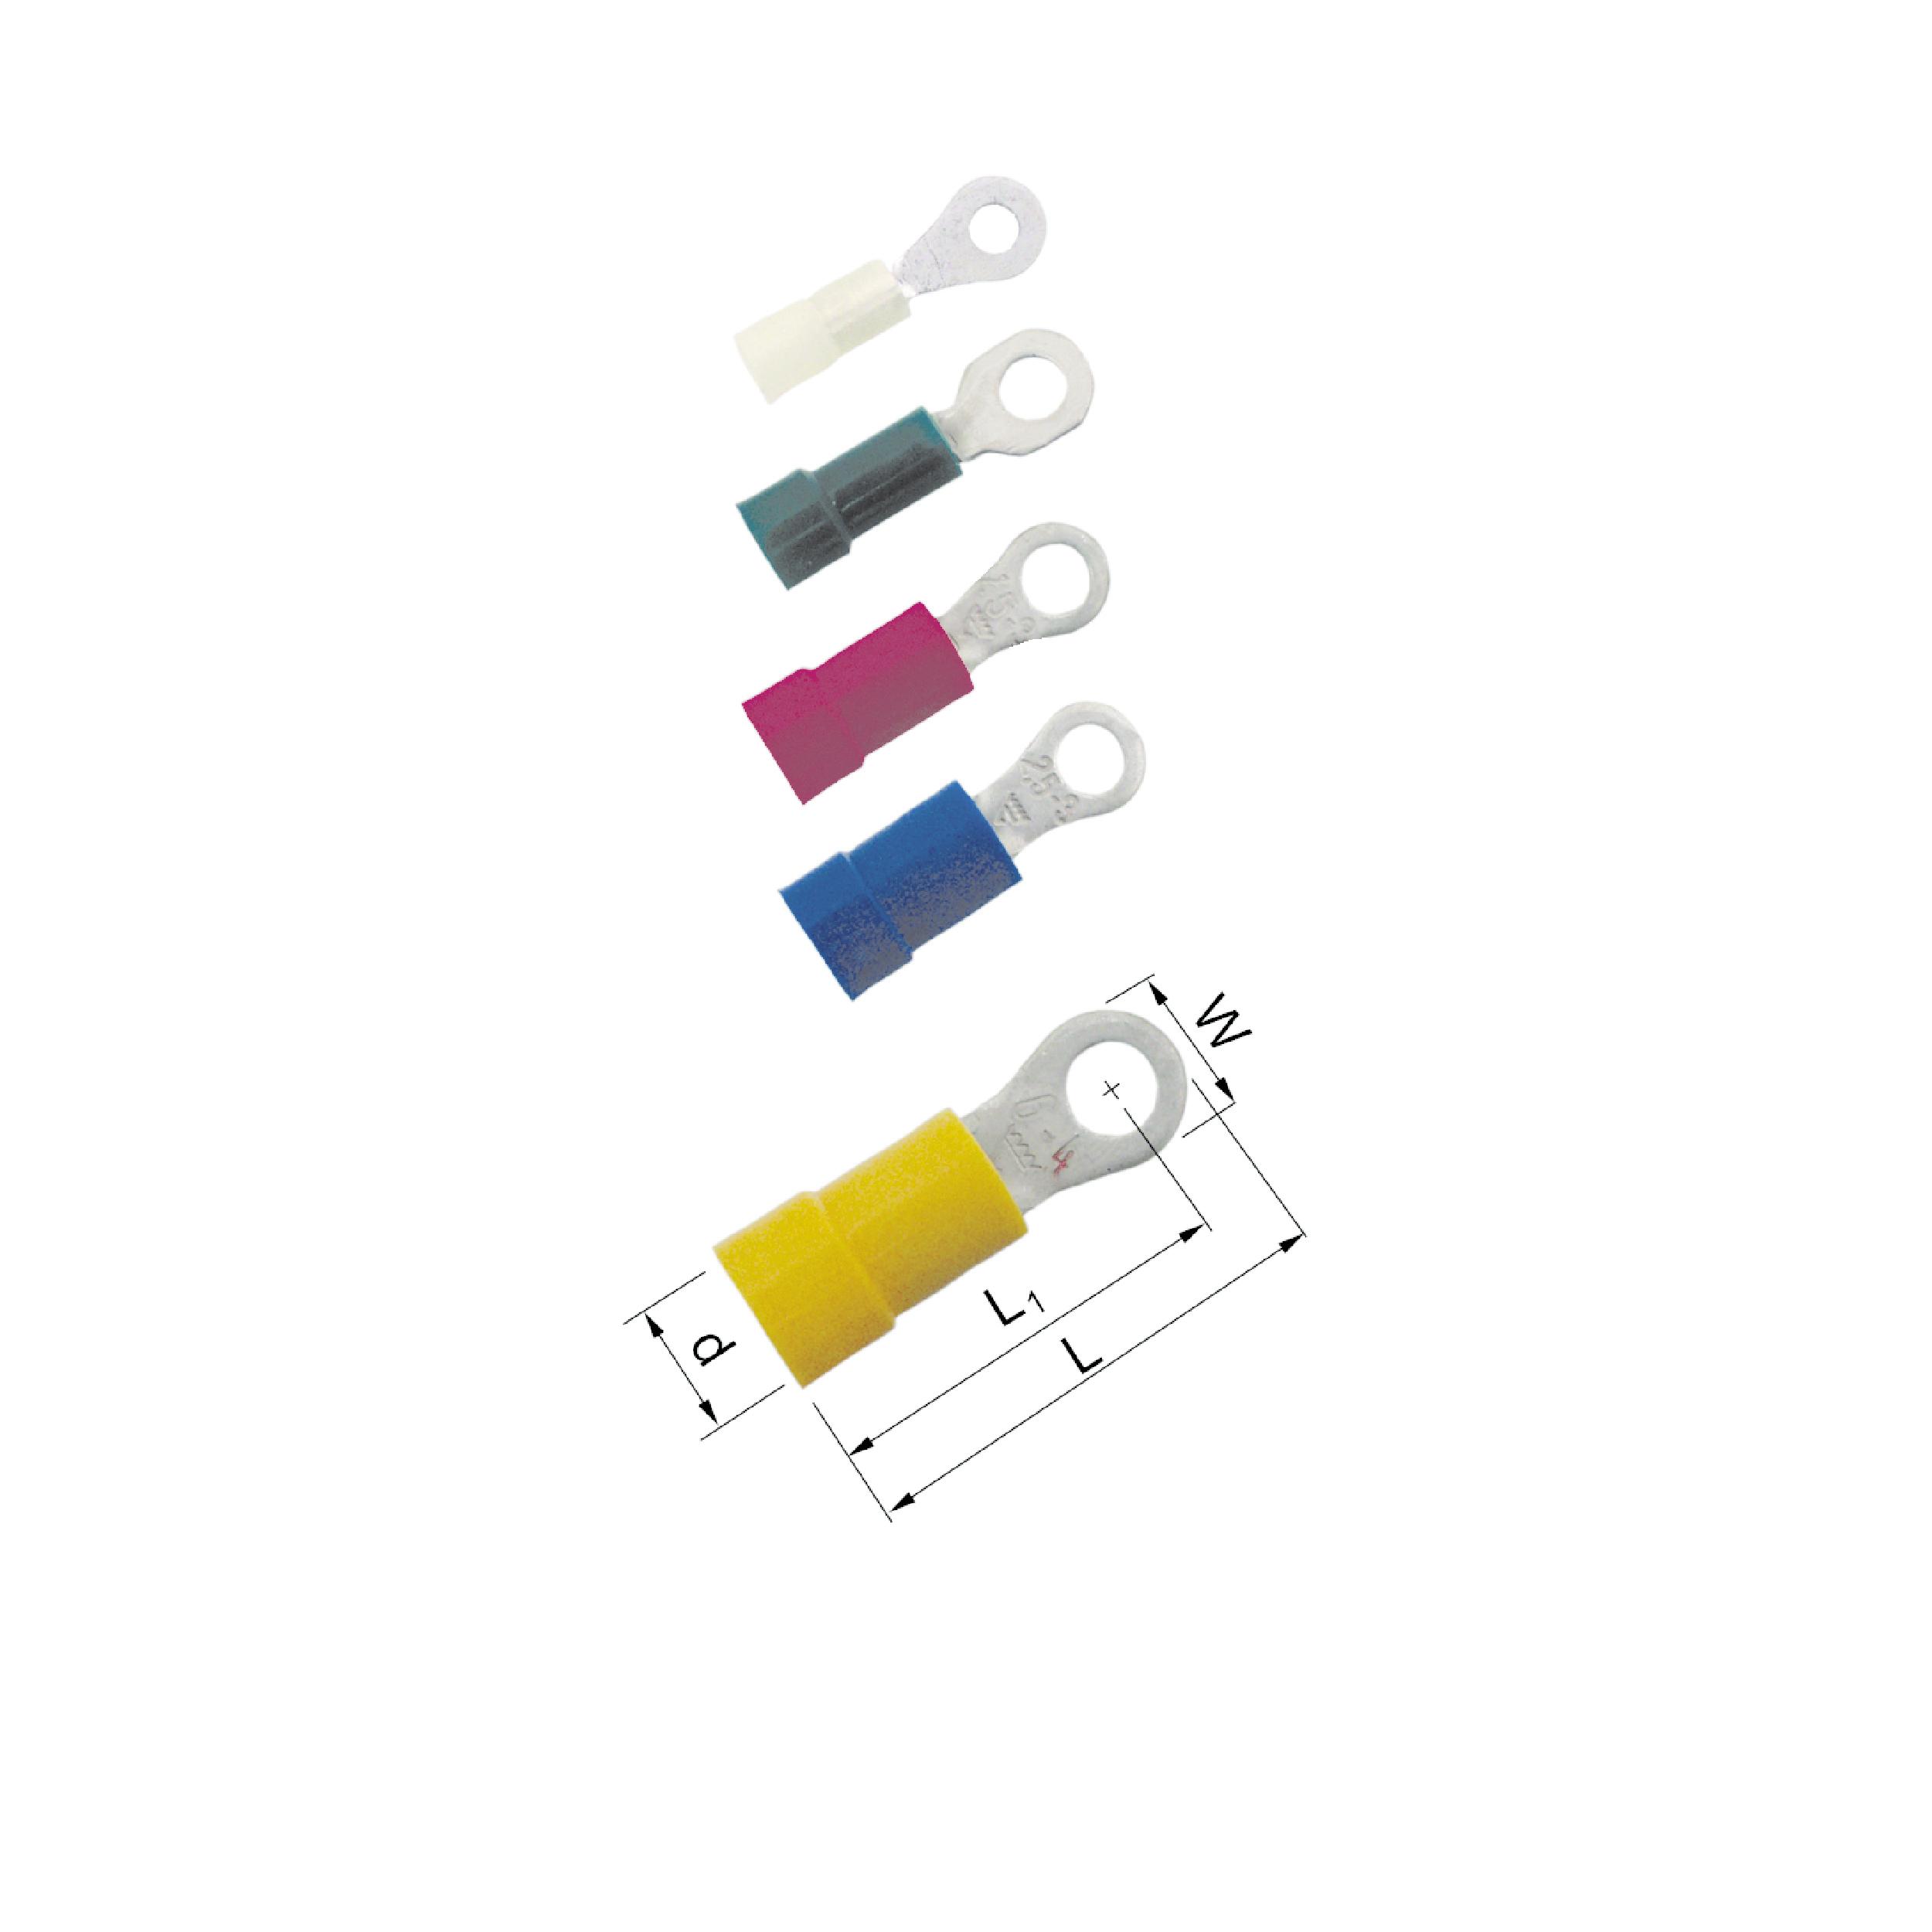 Elpress Pre-Insulated Ring Terminals - Halogen Free (0.1-6mm²)